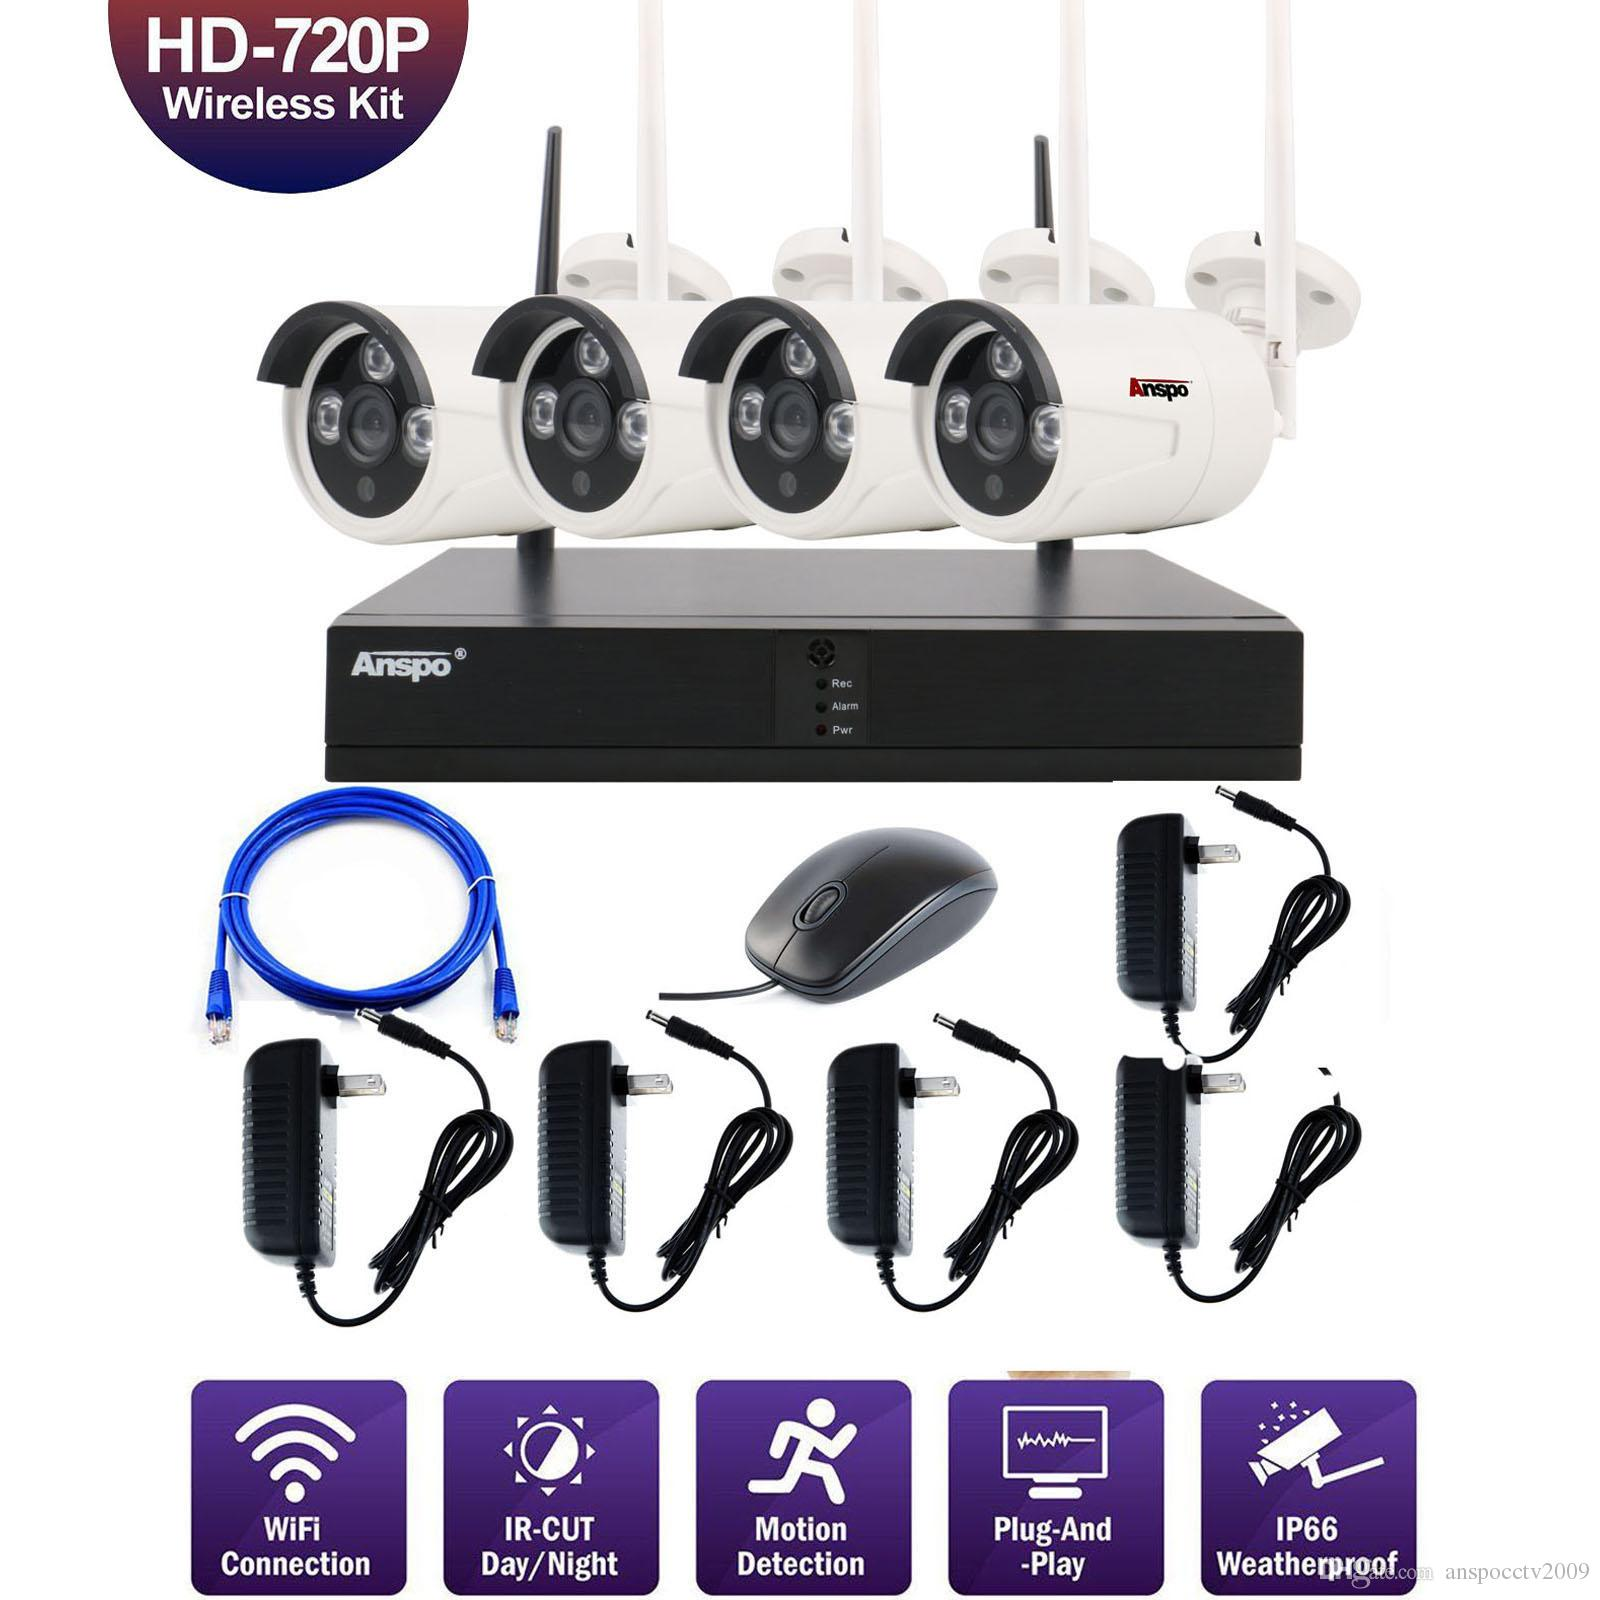 4CH Wireless Security Camera System WiFi Camera Kit NVR 1080P Night Vision IR-Cut CCTV Home Surveillance System Waterproof